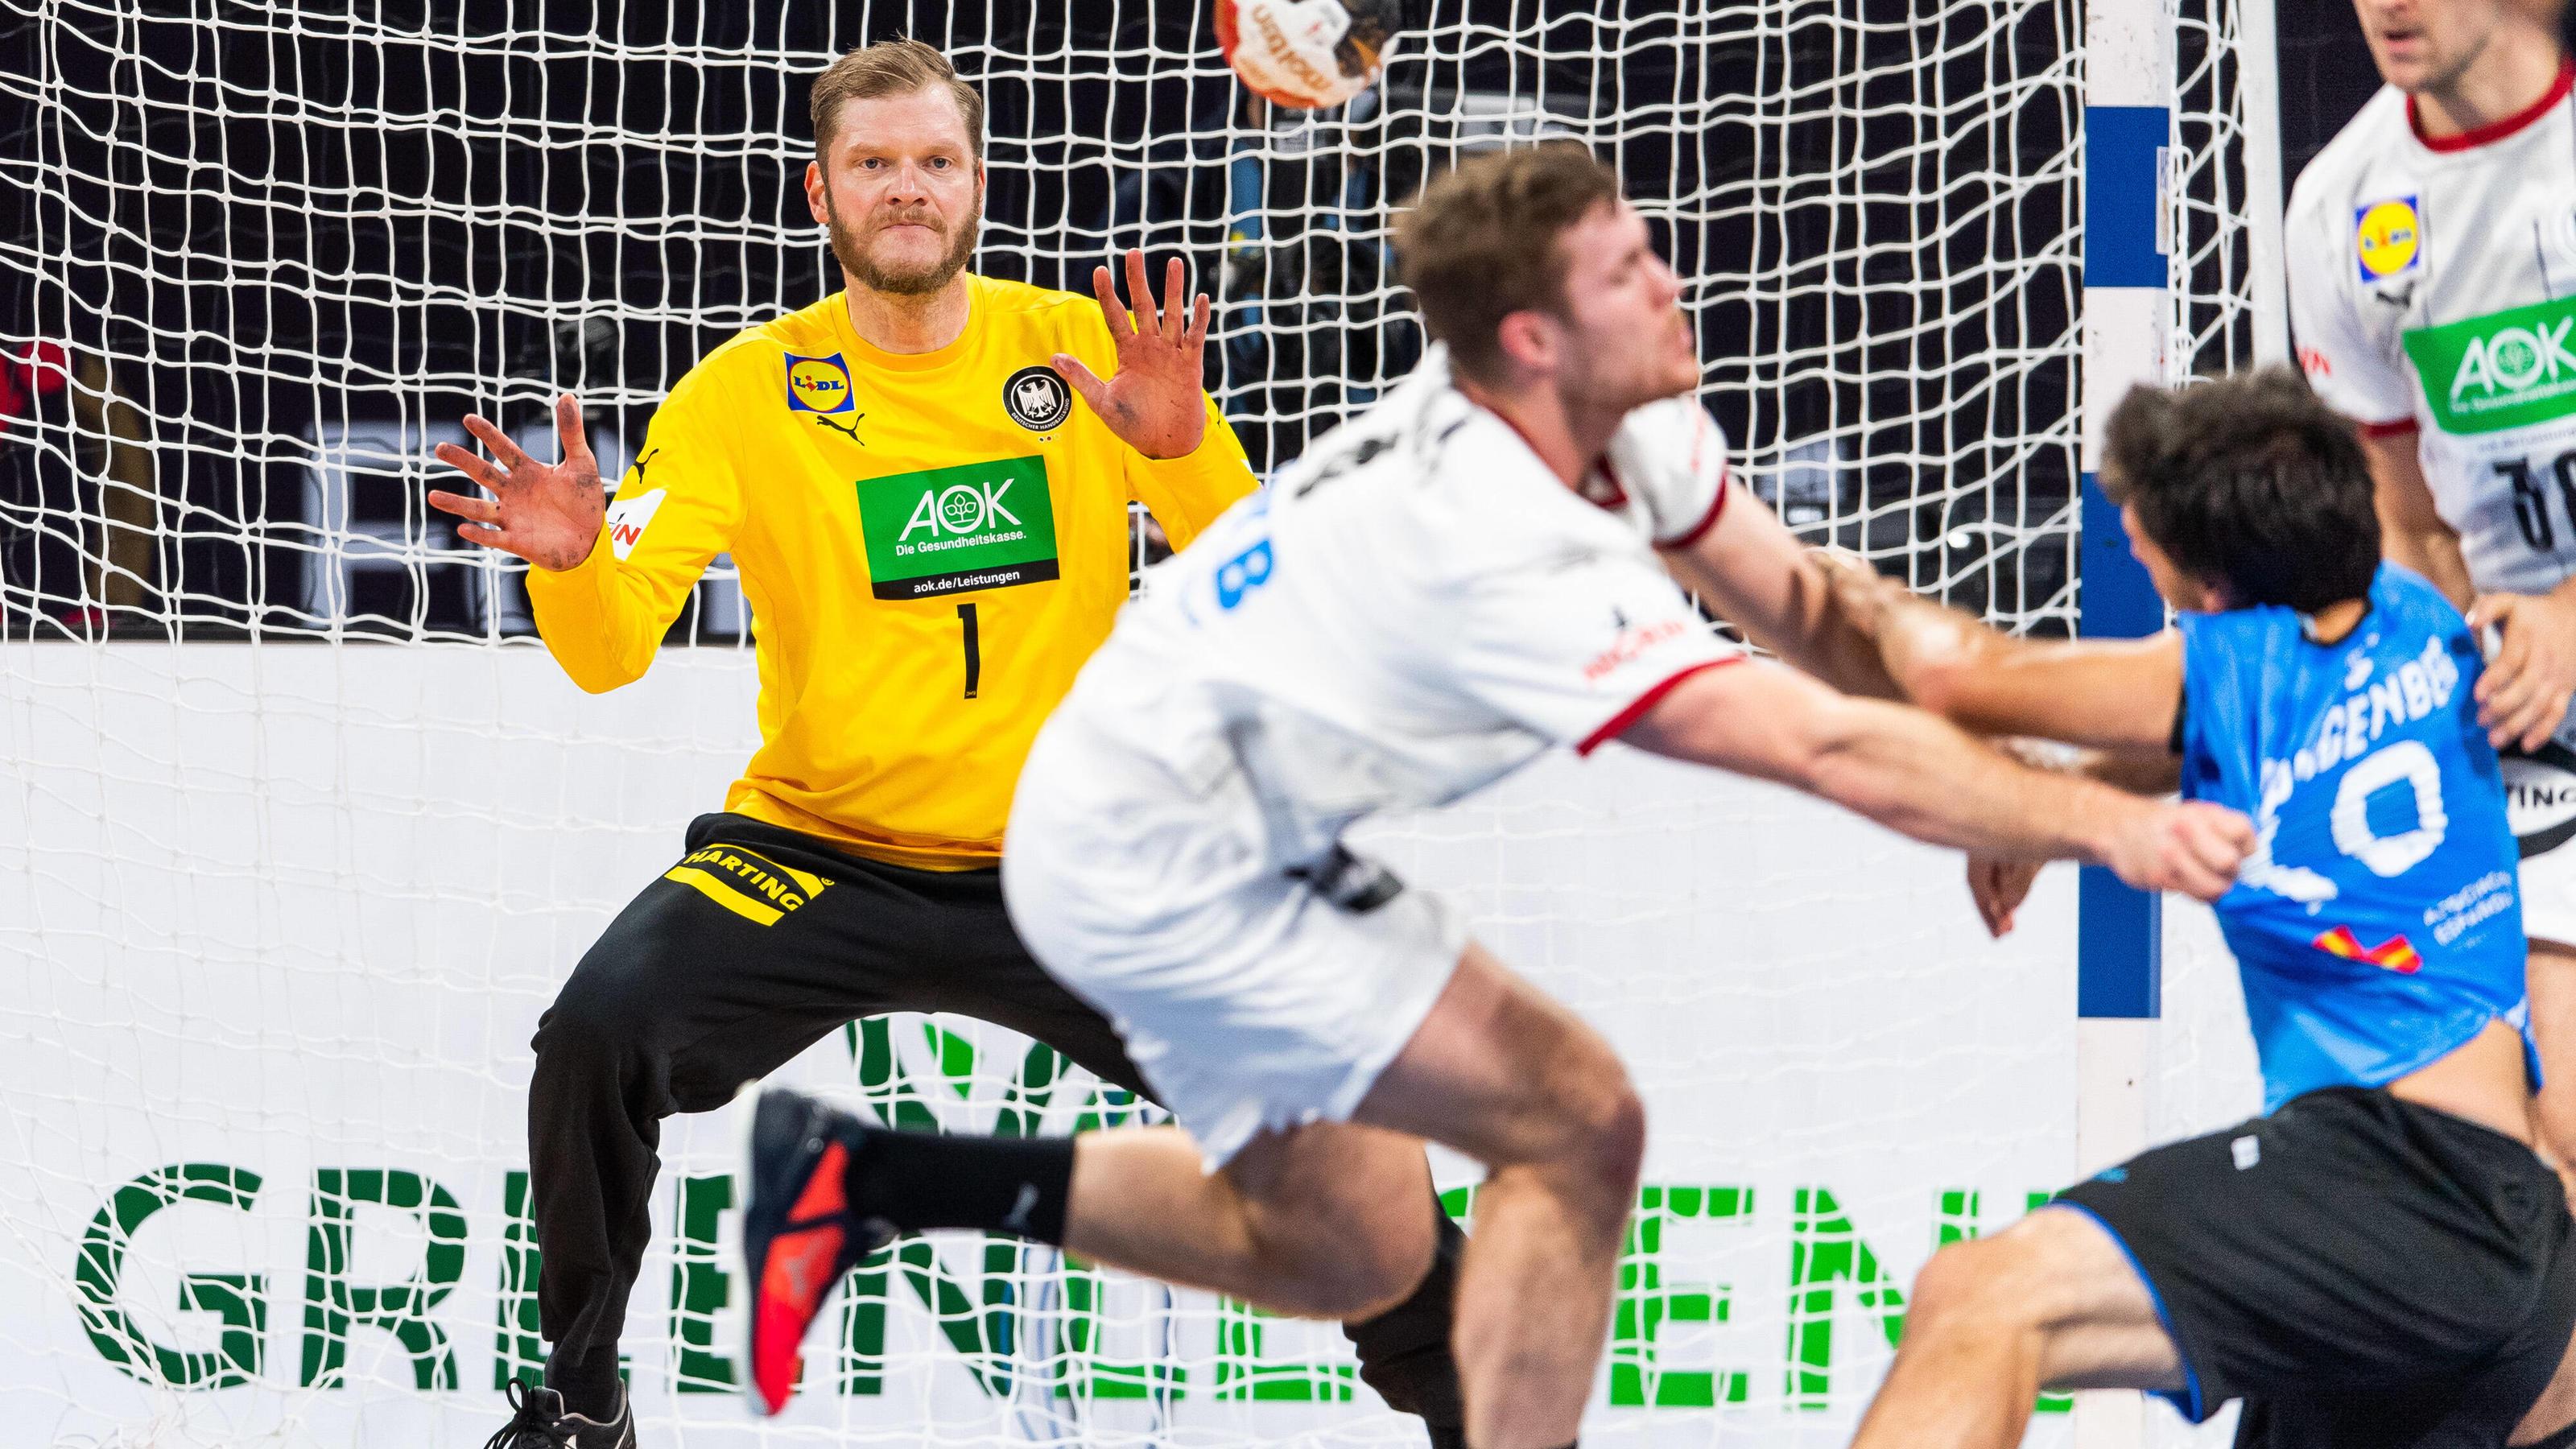 Handball-WM: Deutsche Handballer kritisieren Spiel gegen Kap Verde nach positiven Coronatests